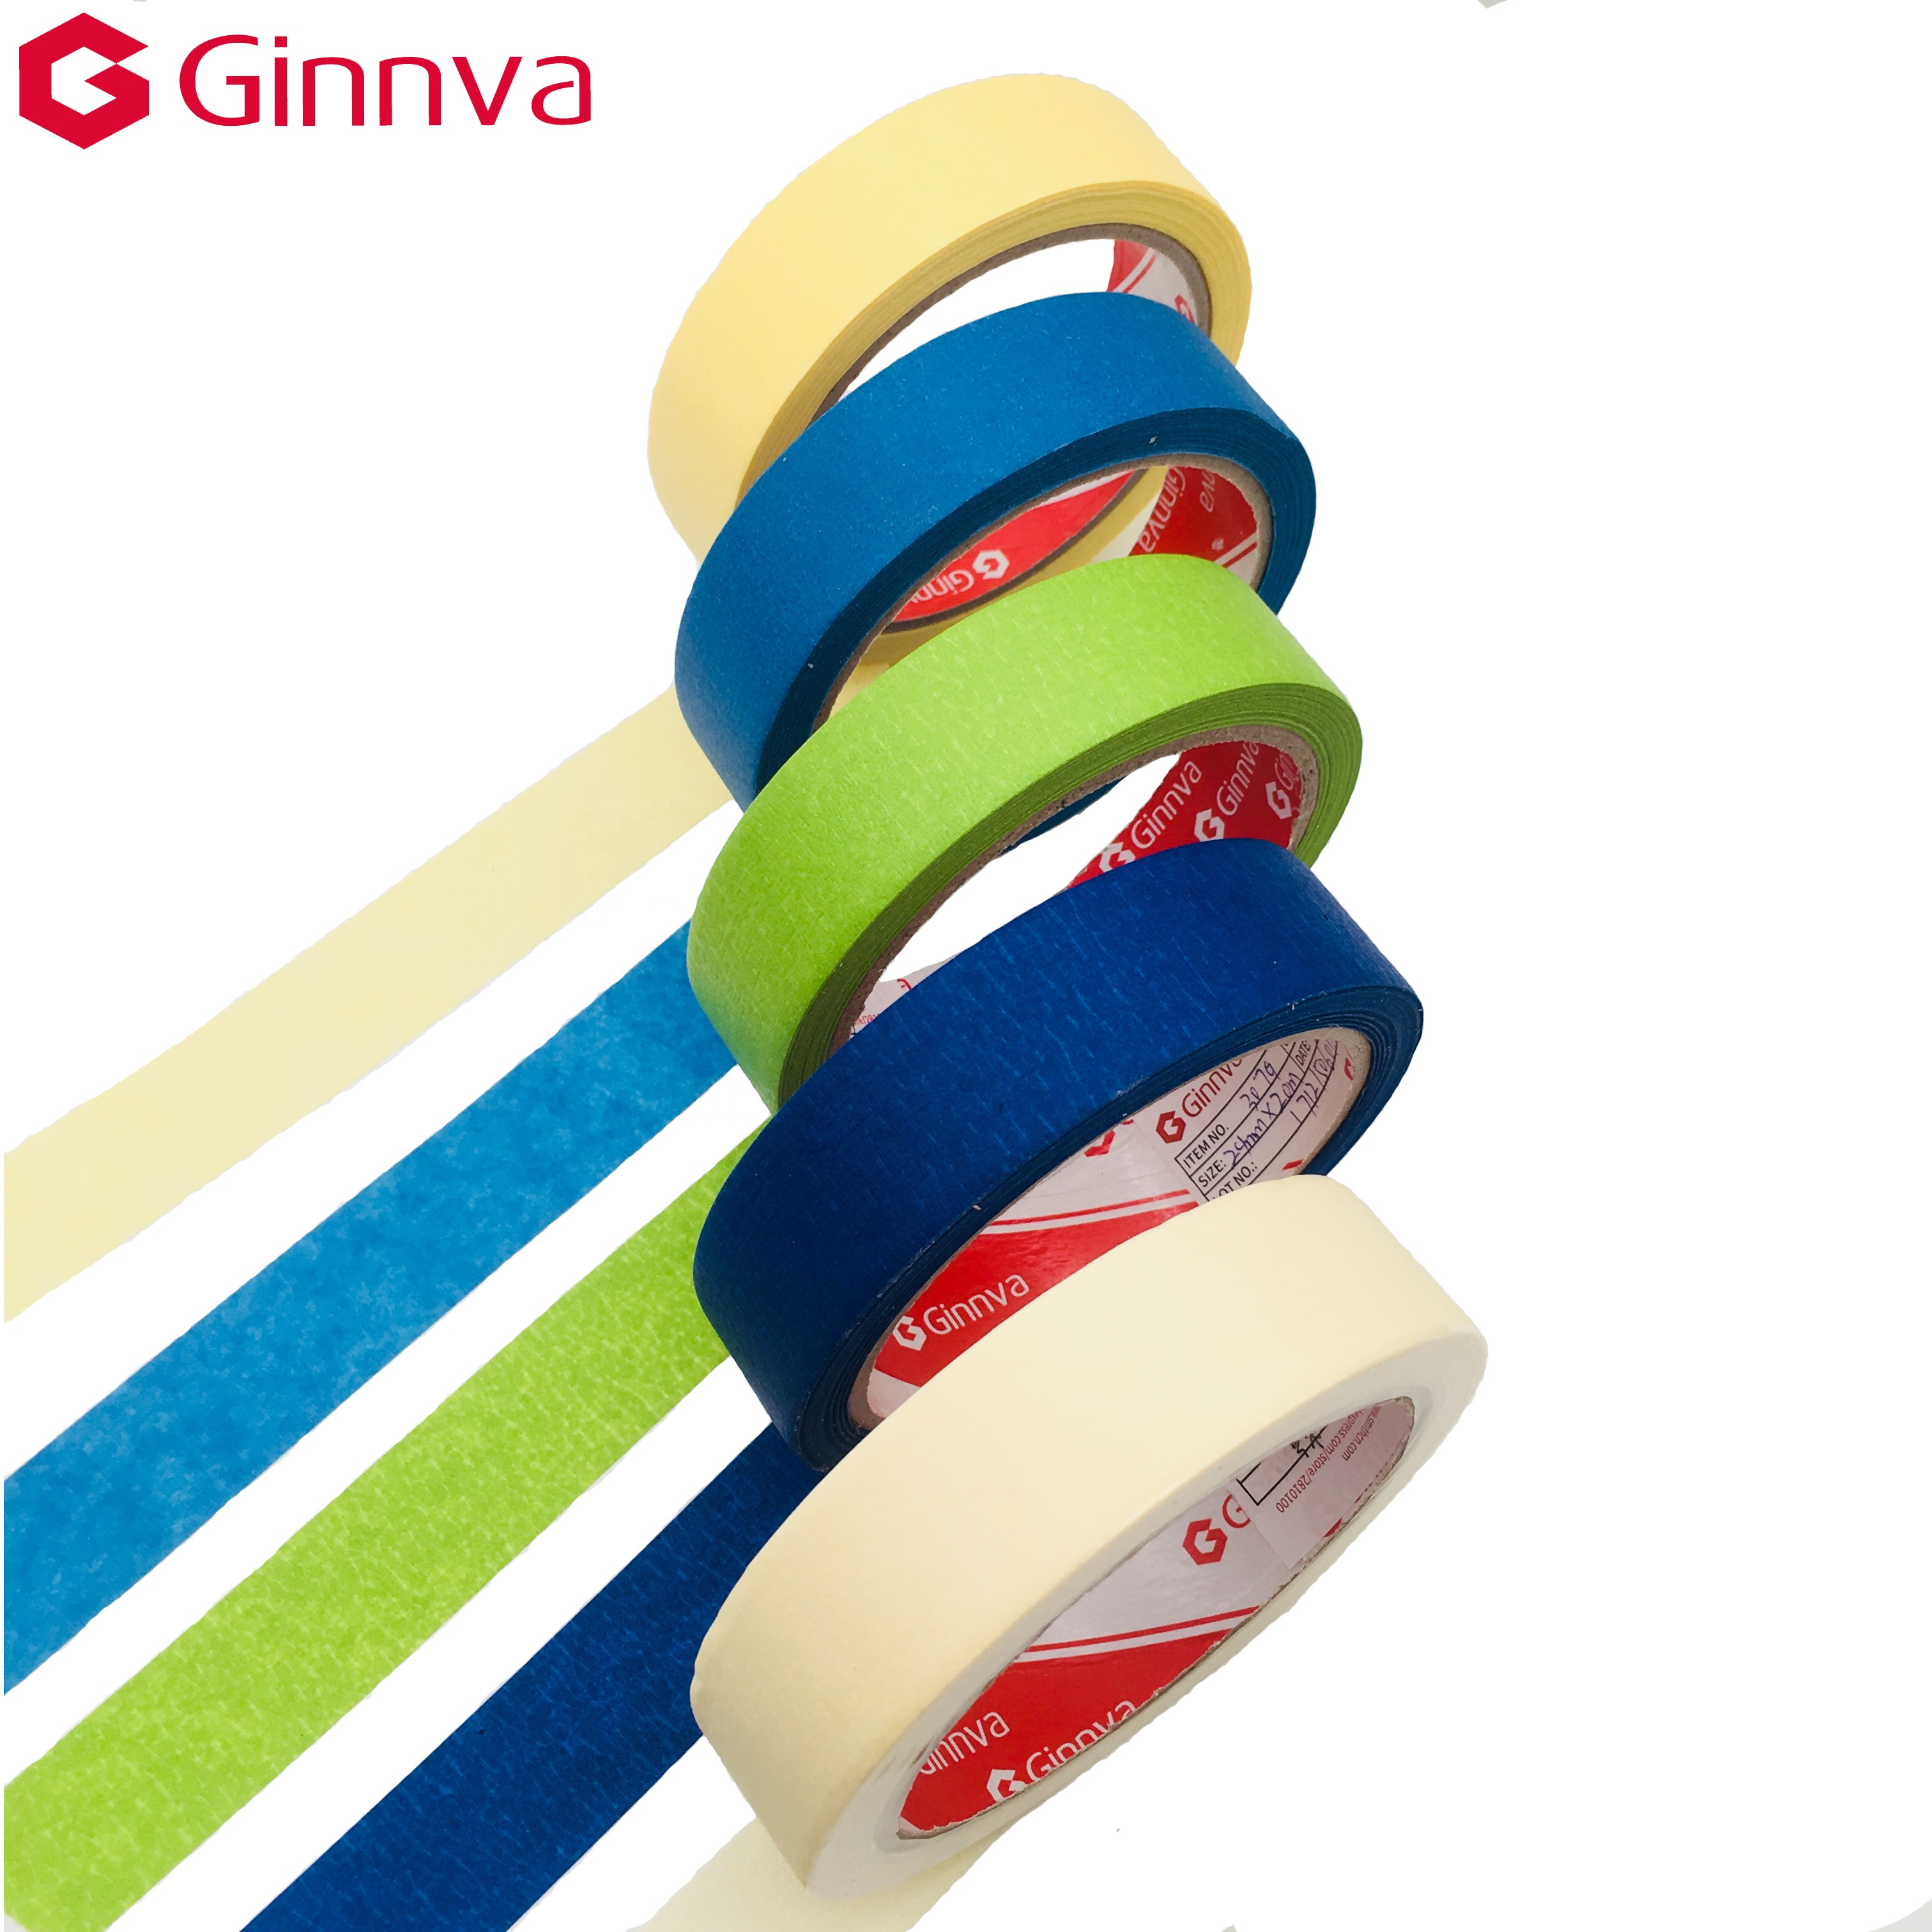 Ginnva Jinghua tape europe crepe paper masking tape home decoration